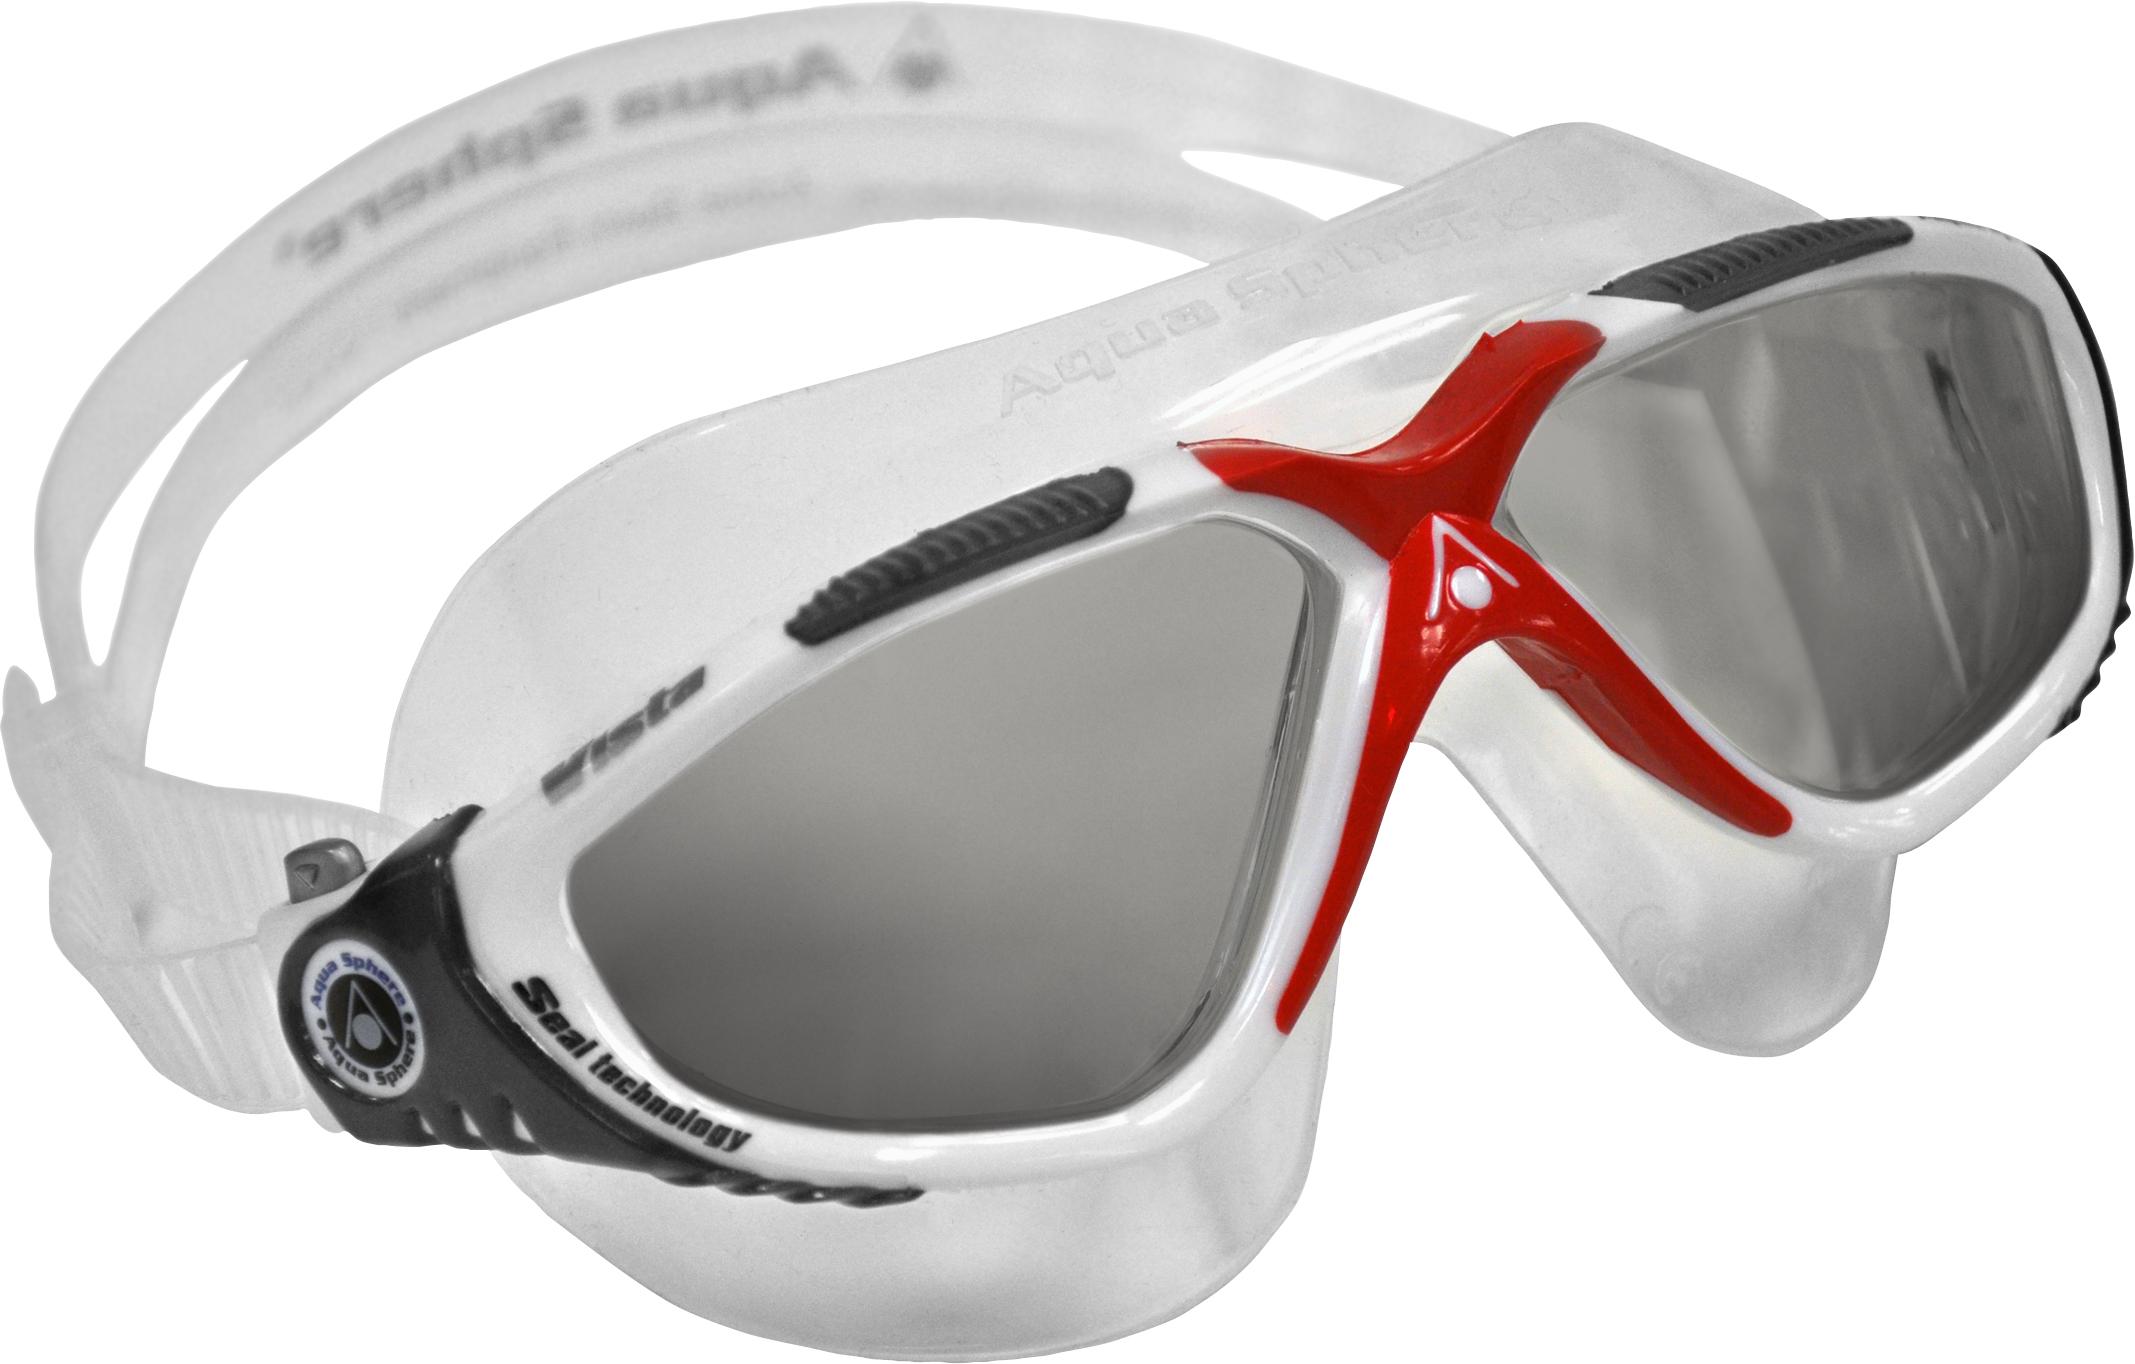 602ff355388 Aqua Sphere Vista Goggles - Unisex   MEC